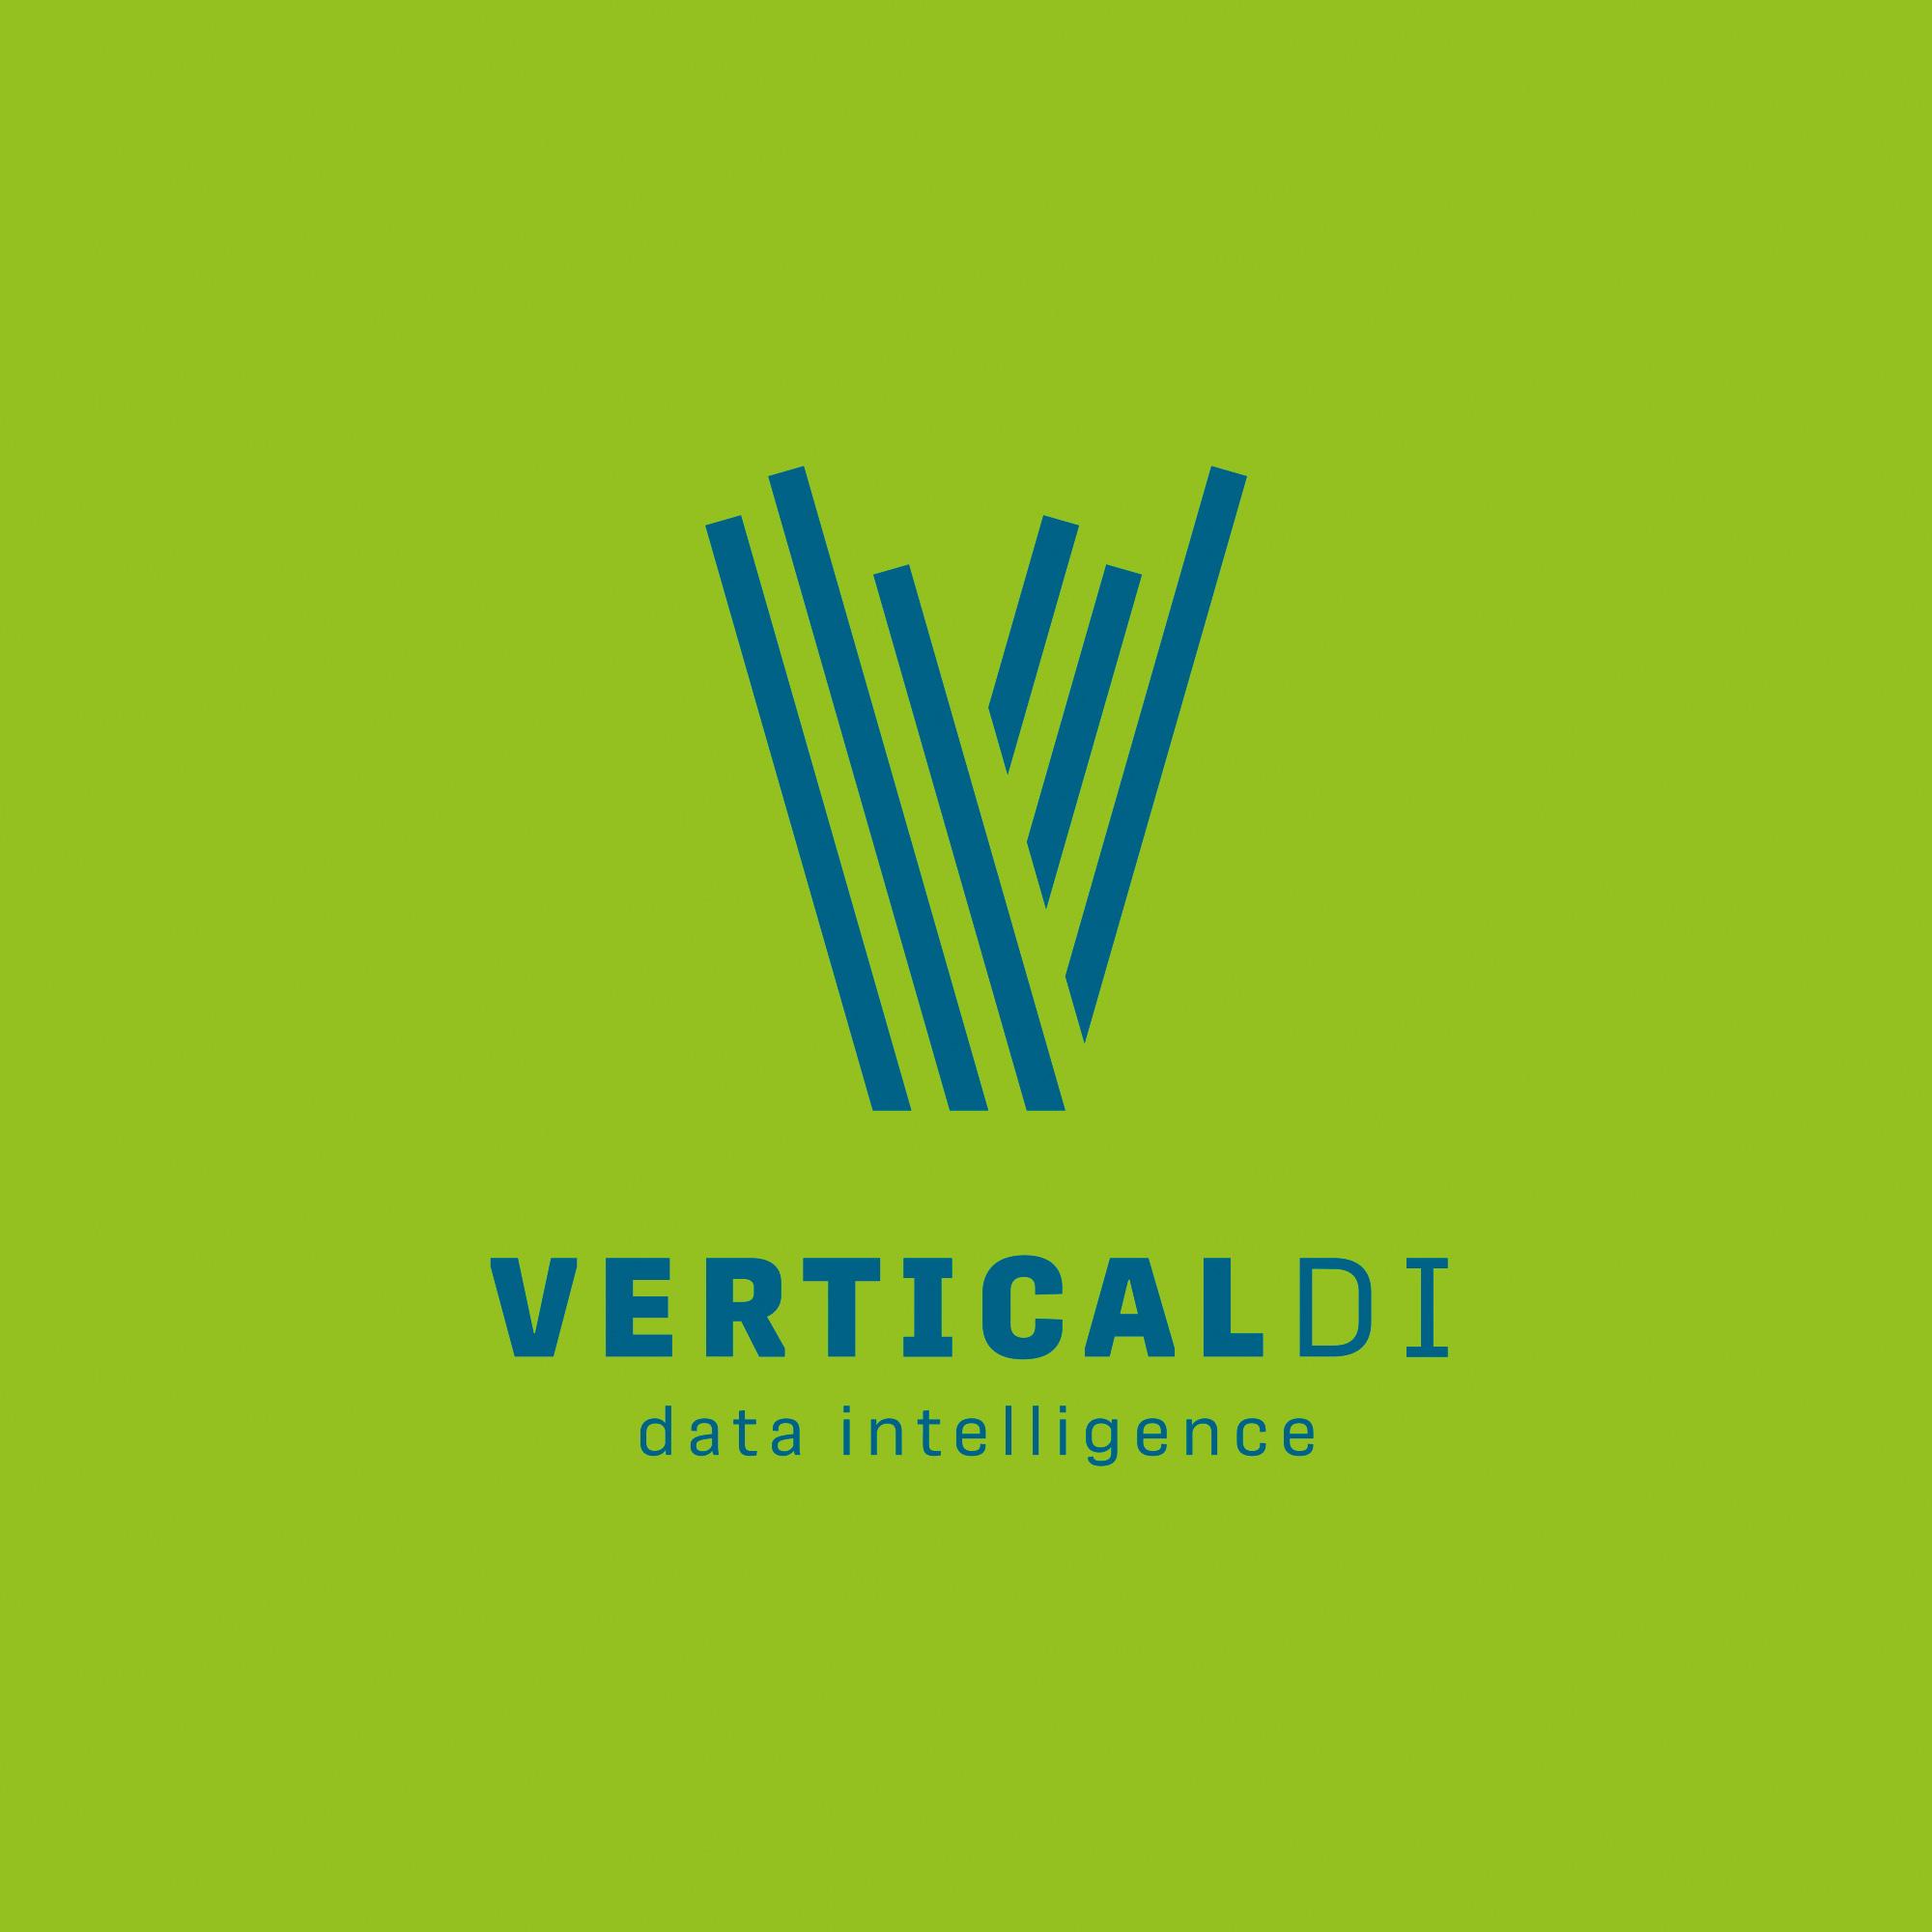 [album/Products_Model_Product/119/Vertical_DI_logo_4c_pos_G.jpg]